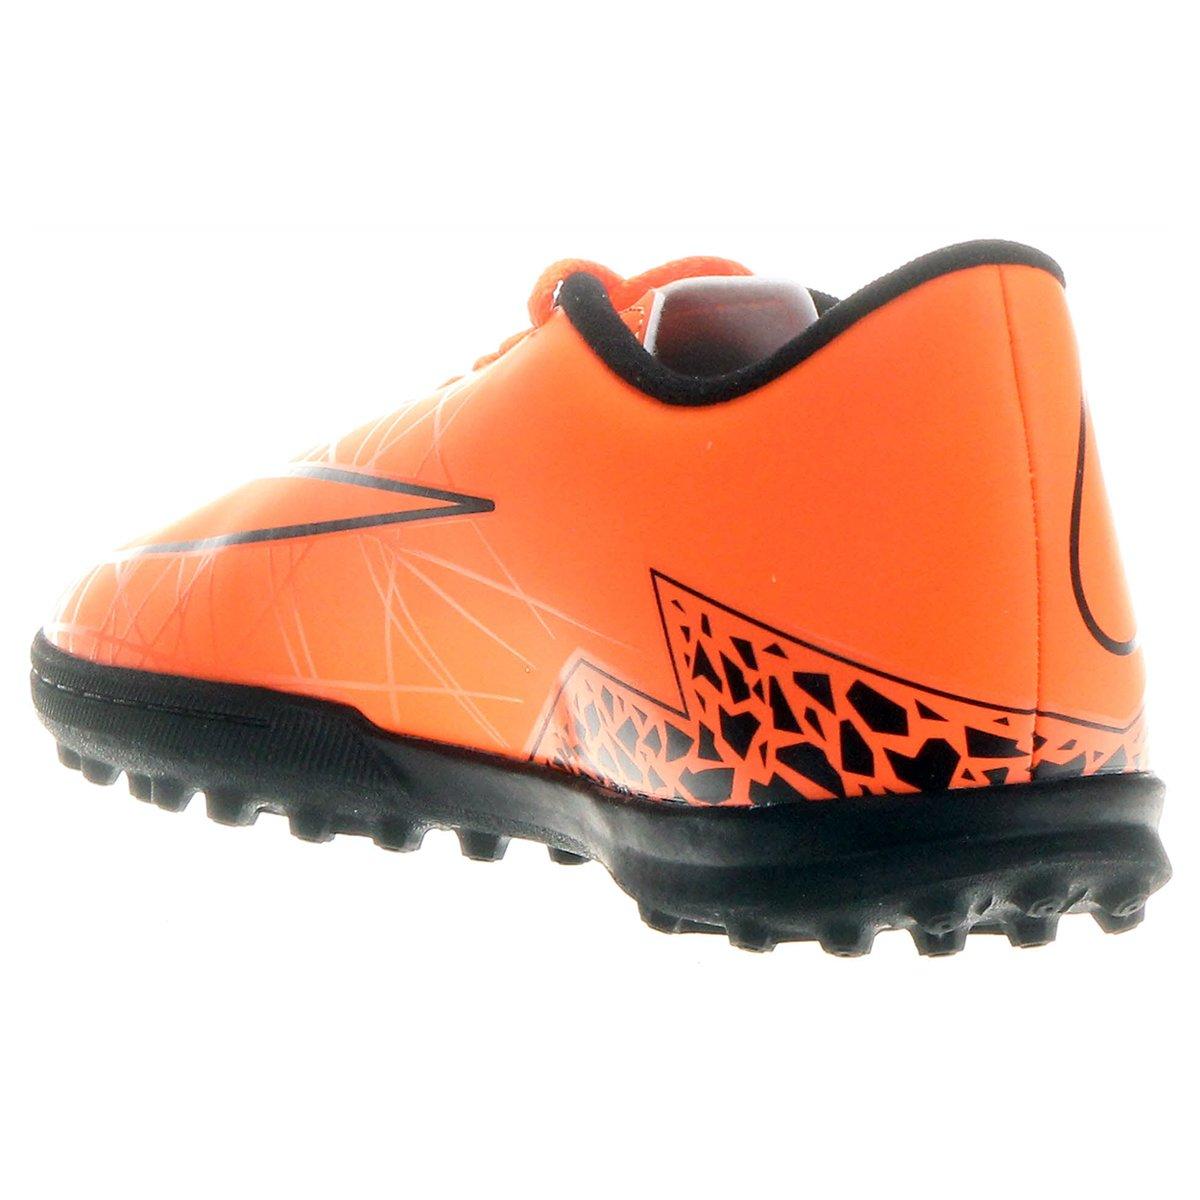 4eb9cd854f Chuteira Society Nike Hypervenom Phade 2 TF - Compre Agora